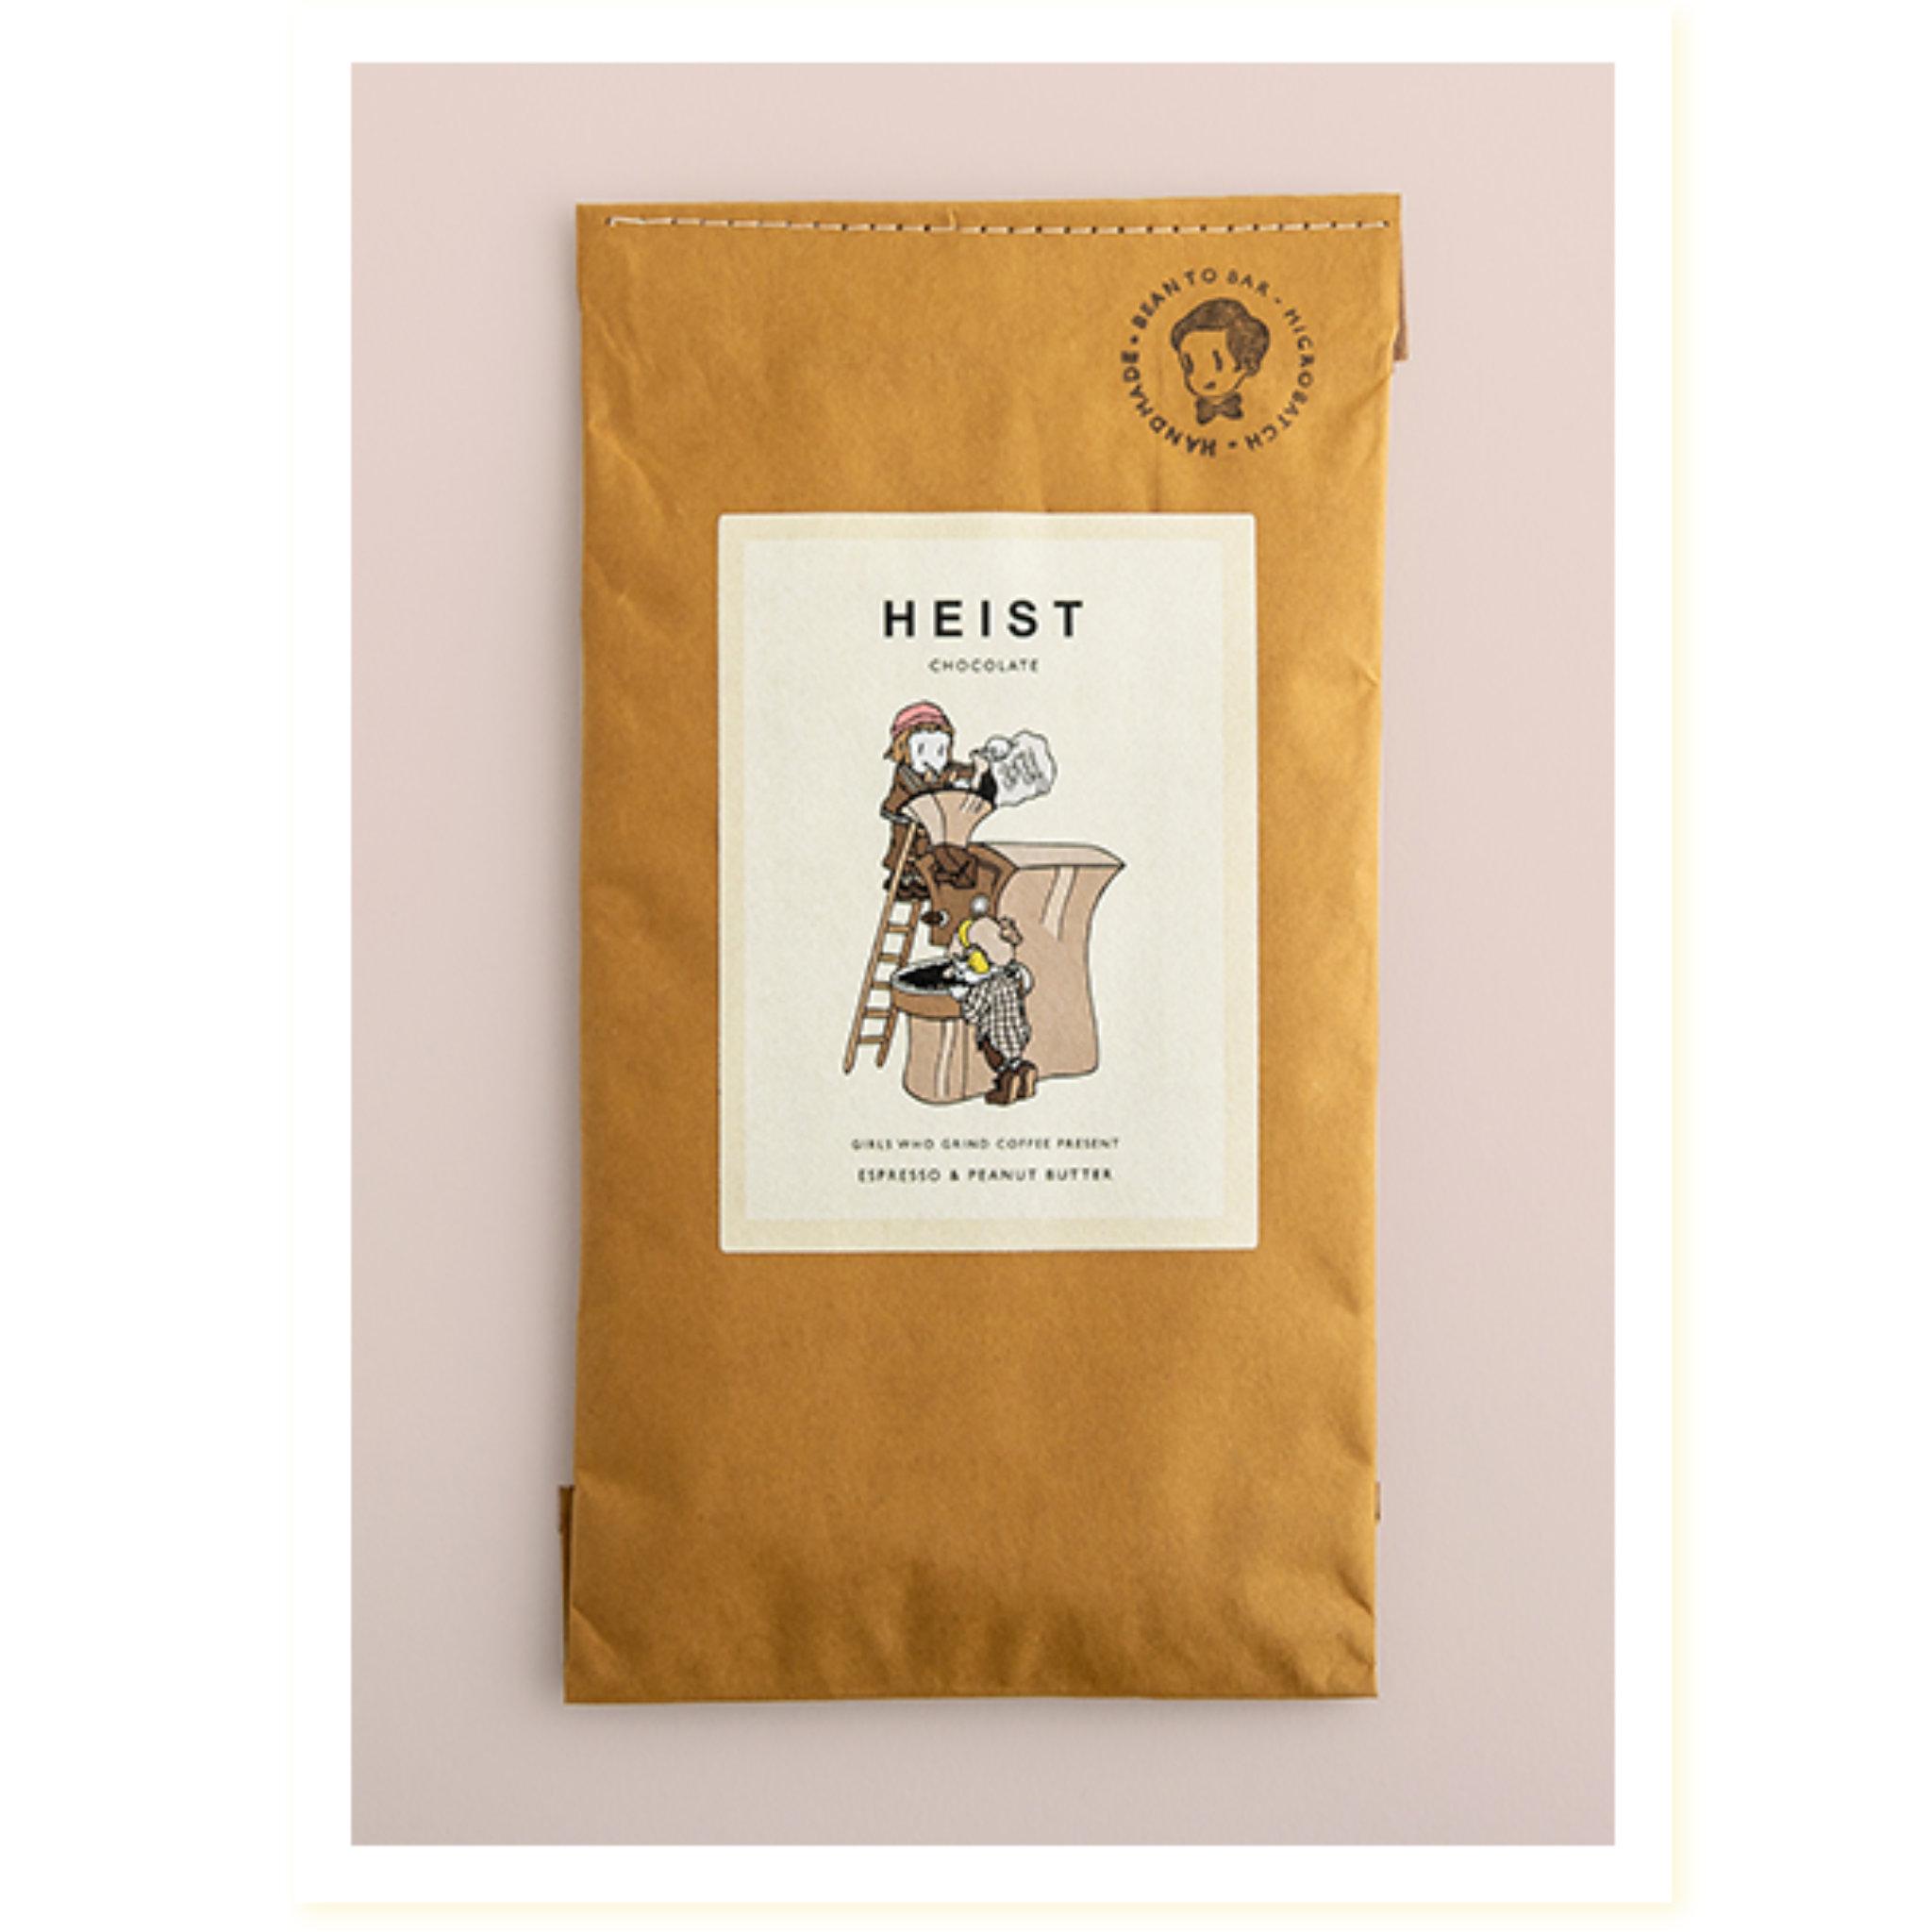 Heist Chocolate- Espresso & Peanut Butter